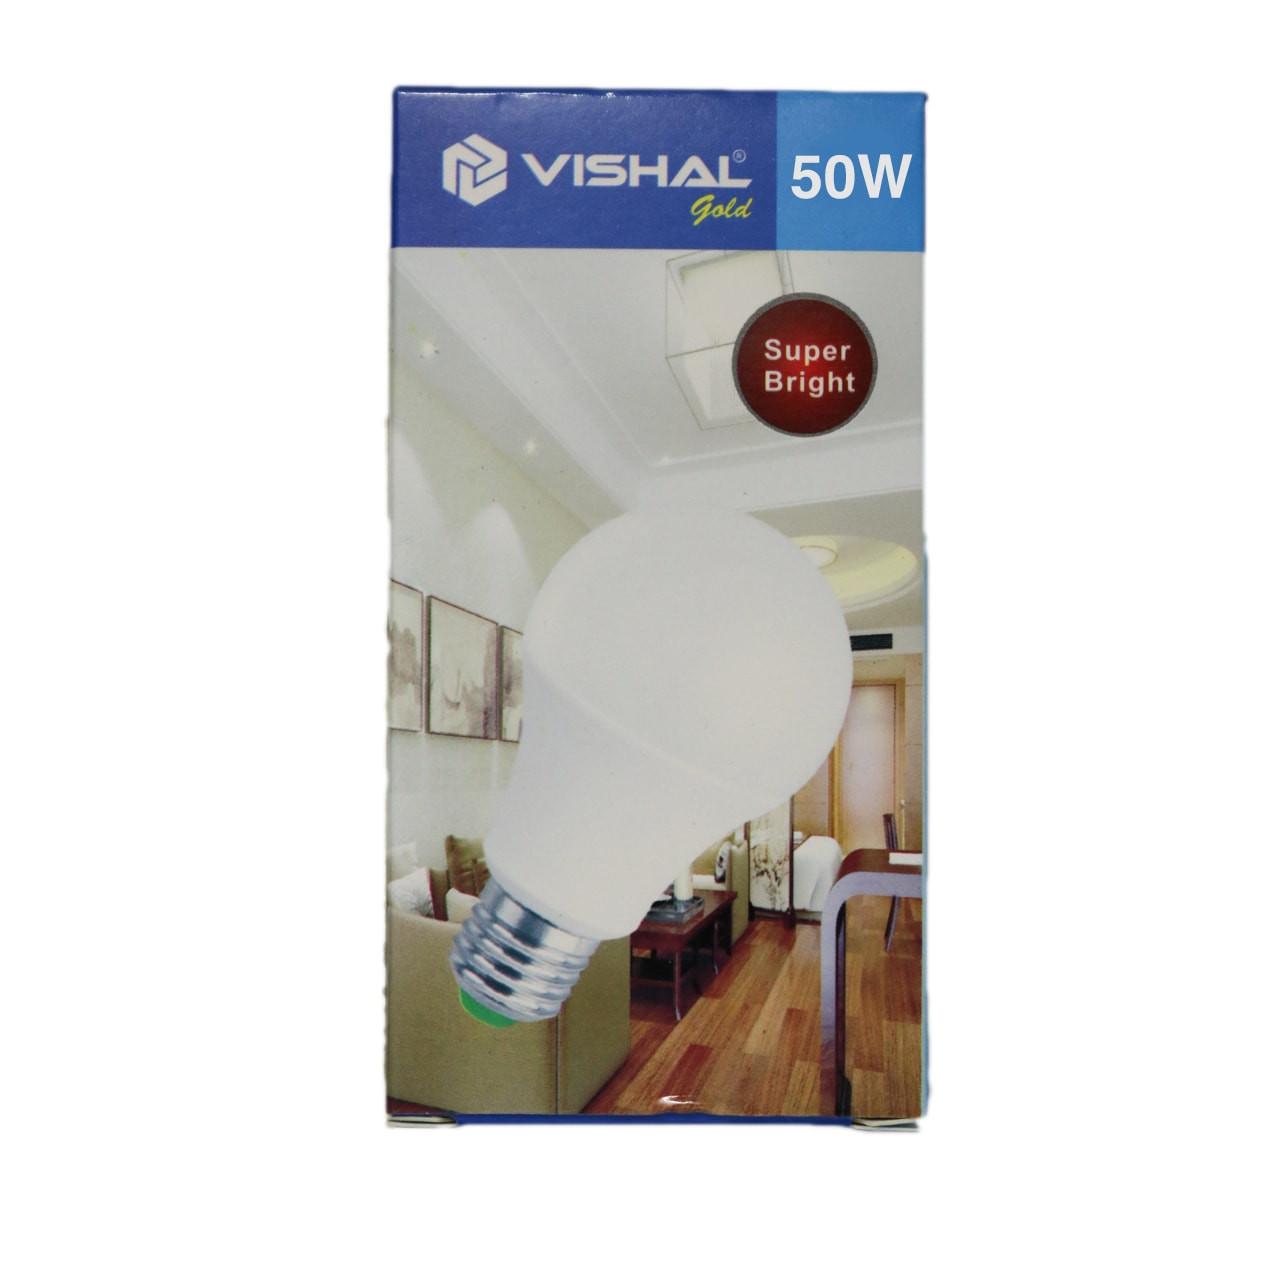 50 Watt Vishal Bulb (e27)